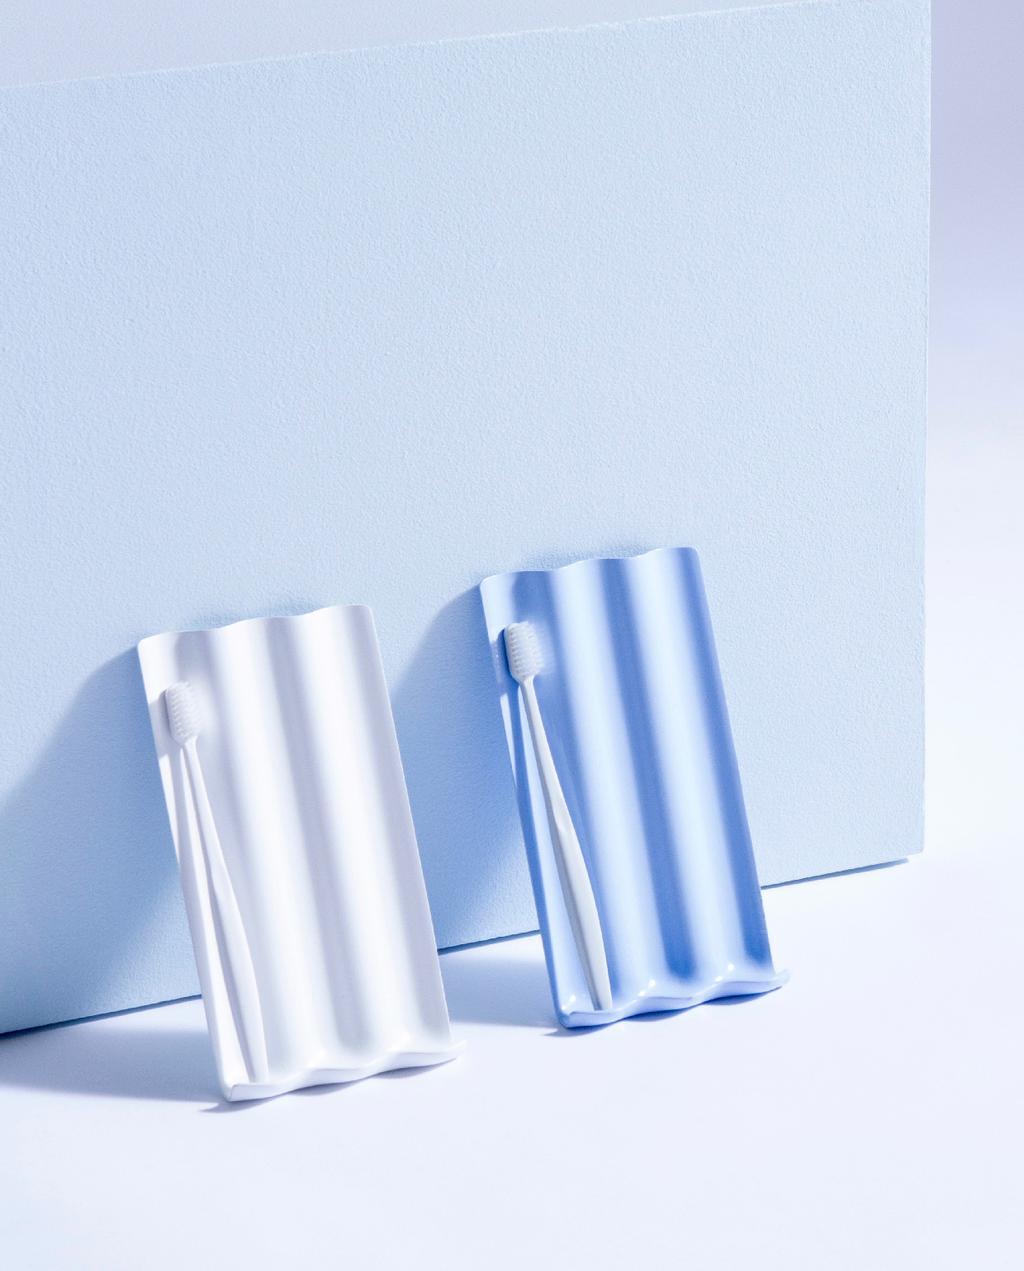 vtwonen blog studentdesign | badkamer design tandenborstelhouder